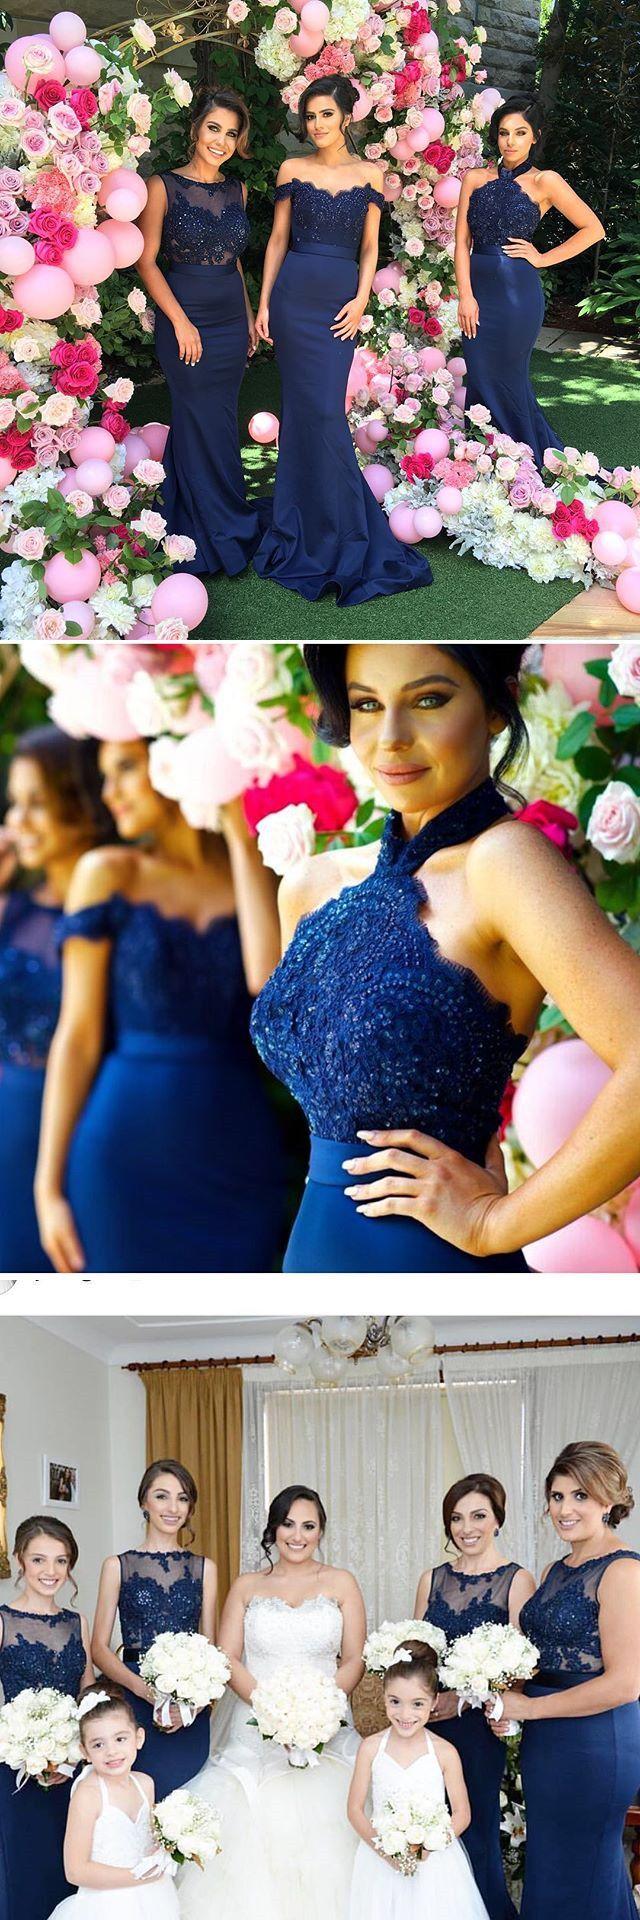 navy blue bridesmaid dresses, mermaid long bridesmaid dresses, prom dresses, evening dresses, party dresses